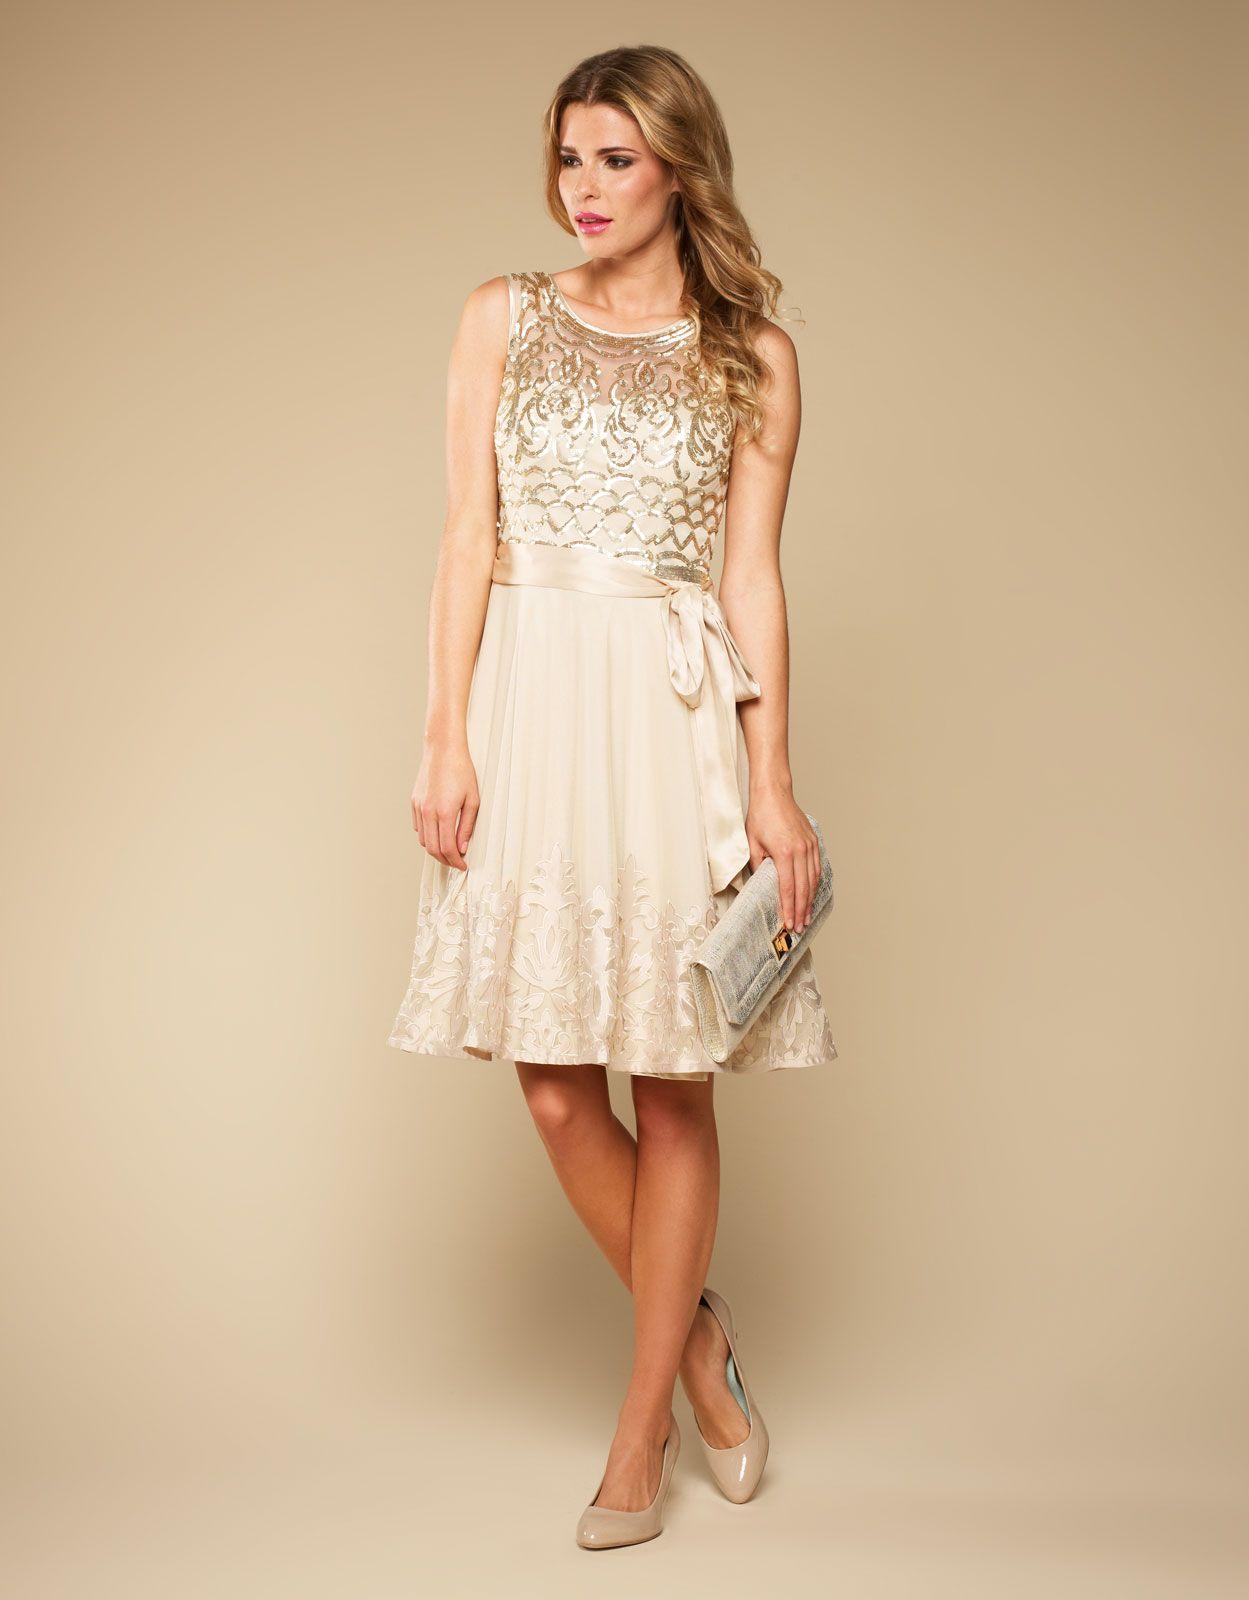 Esme dress gold monsoon my style pinterest monsoon gold esme dress gold monsoon ombrellifo Choice Image